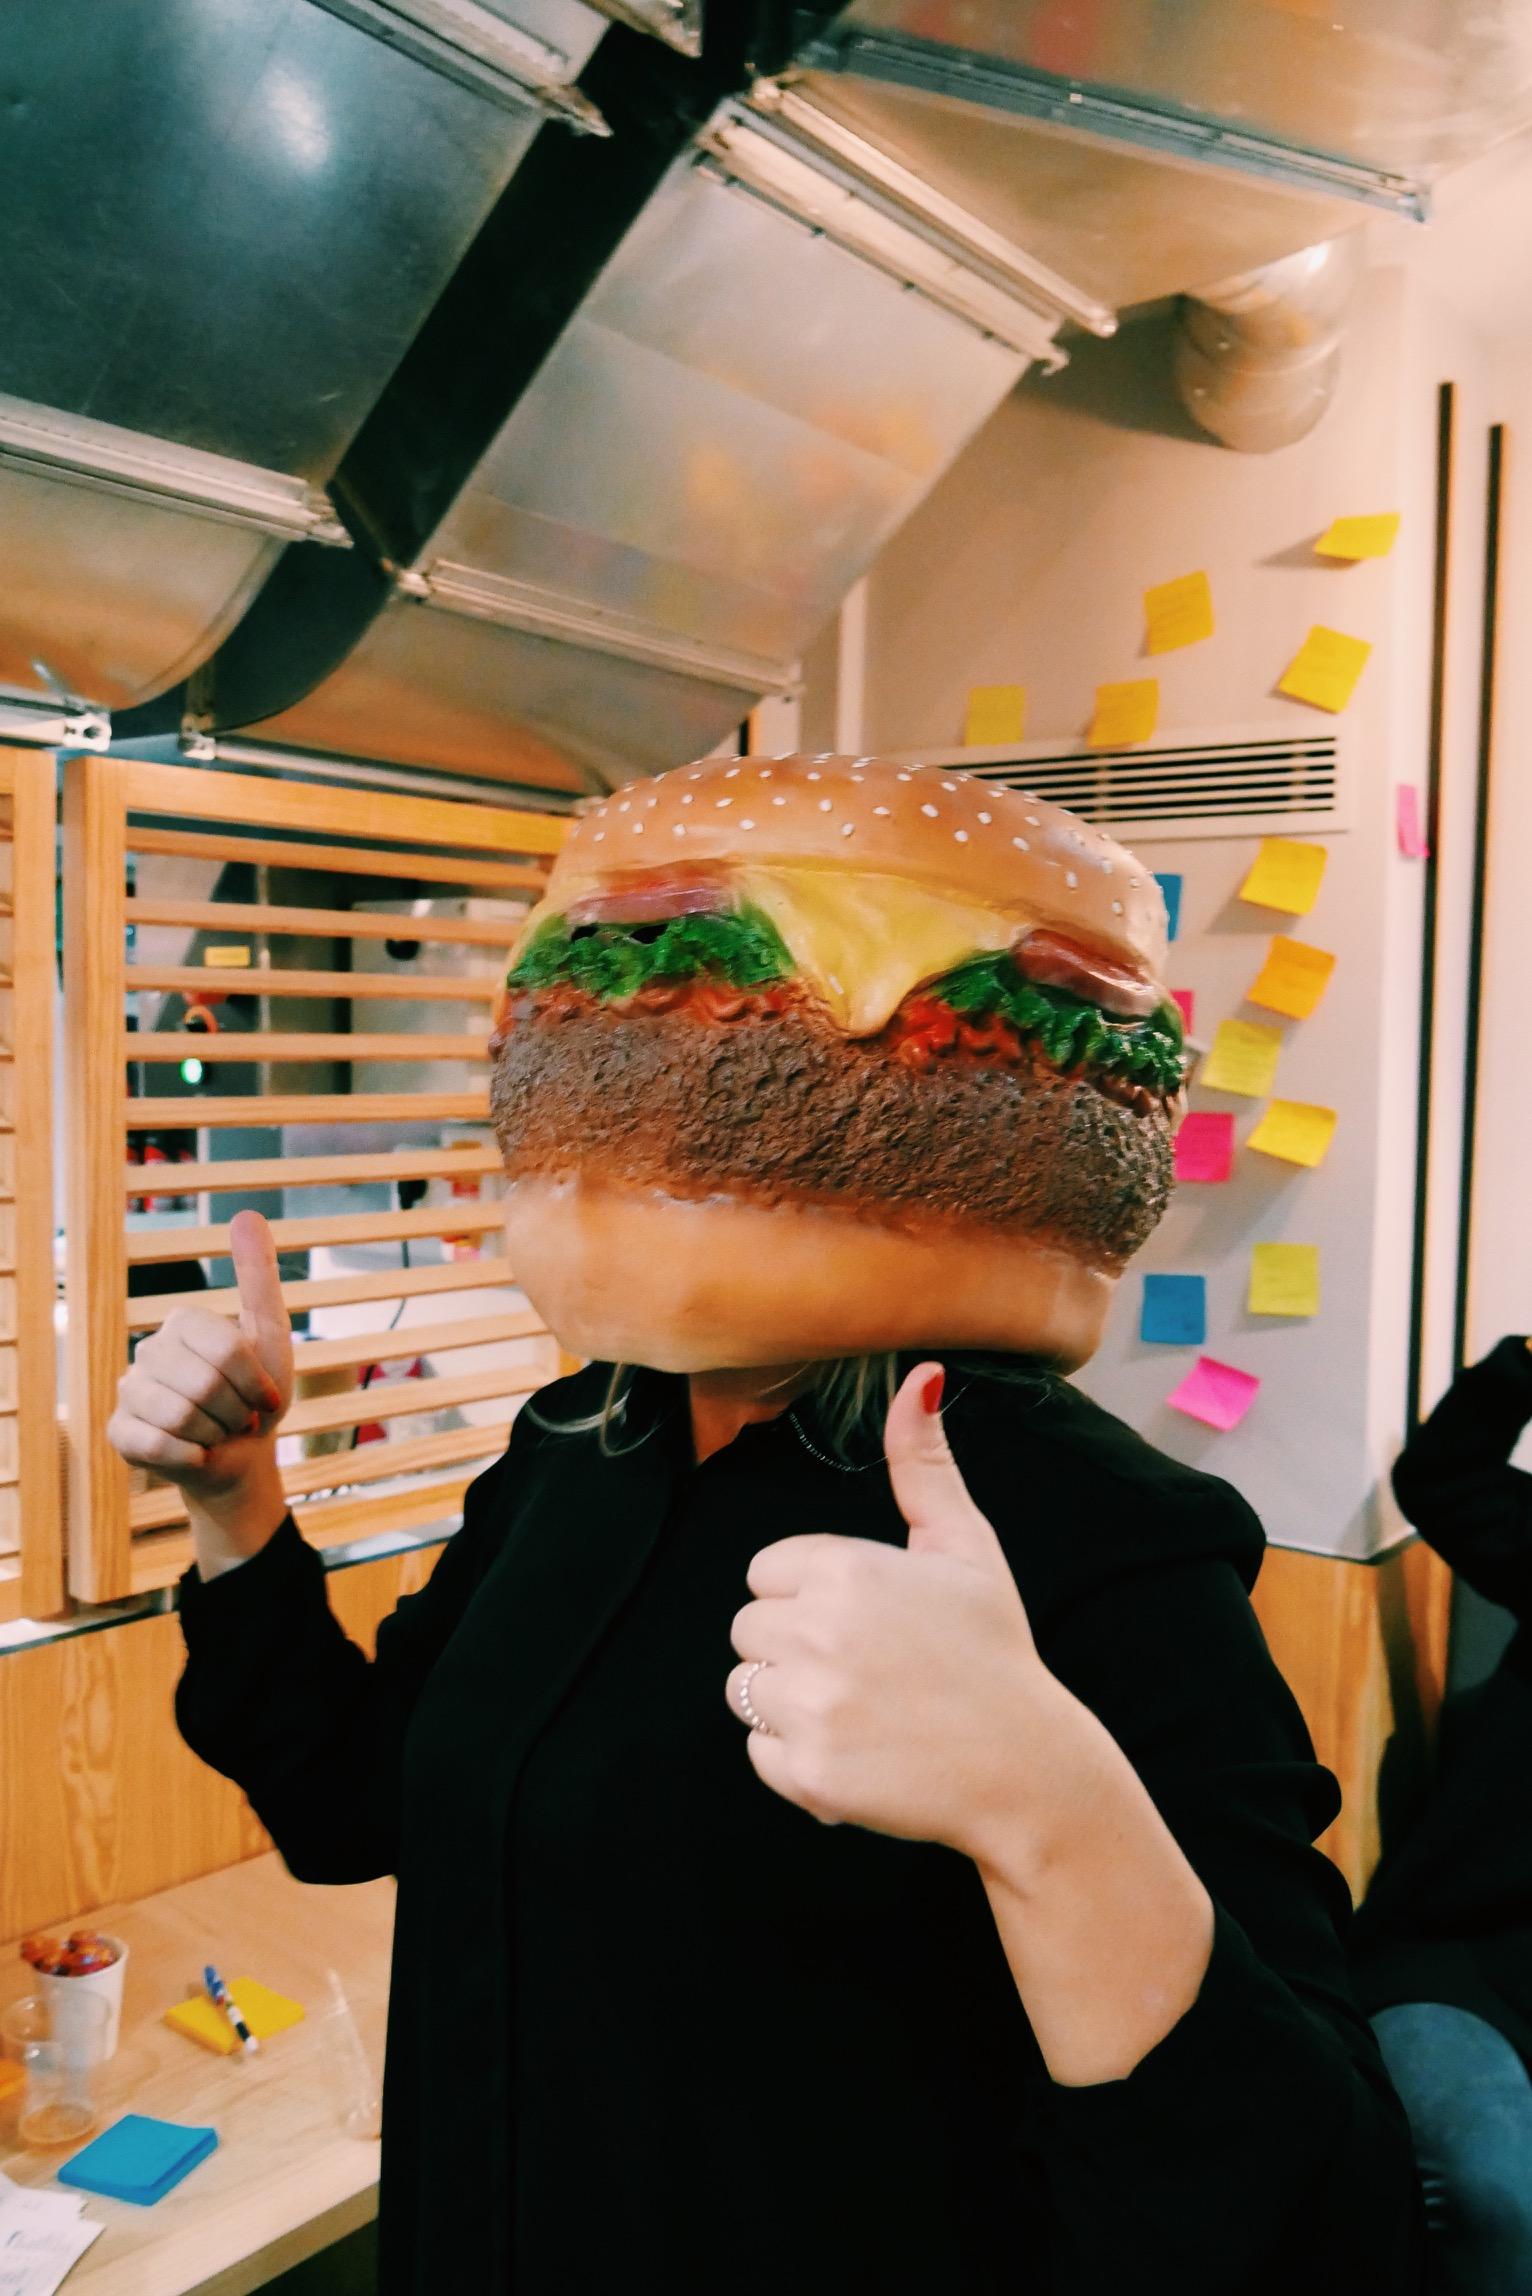 Masque-tête-de-burger-soirée-Roomies-restaurant-paris-photo-usofparis-blog